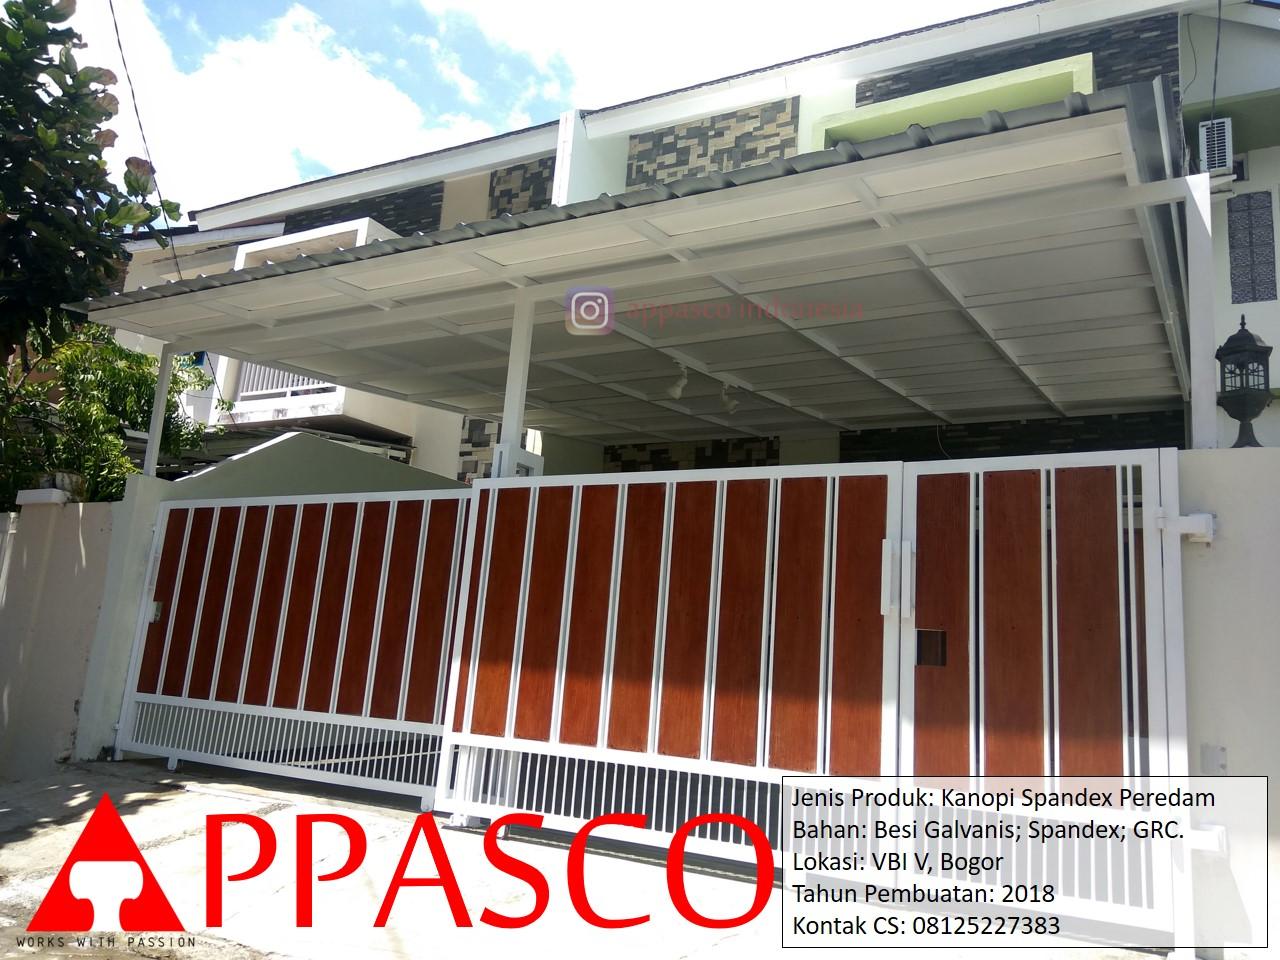 Kanopi Spandek Peredam Besi Galvanis di Villa Bogor Indah